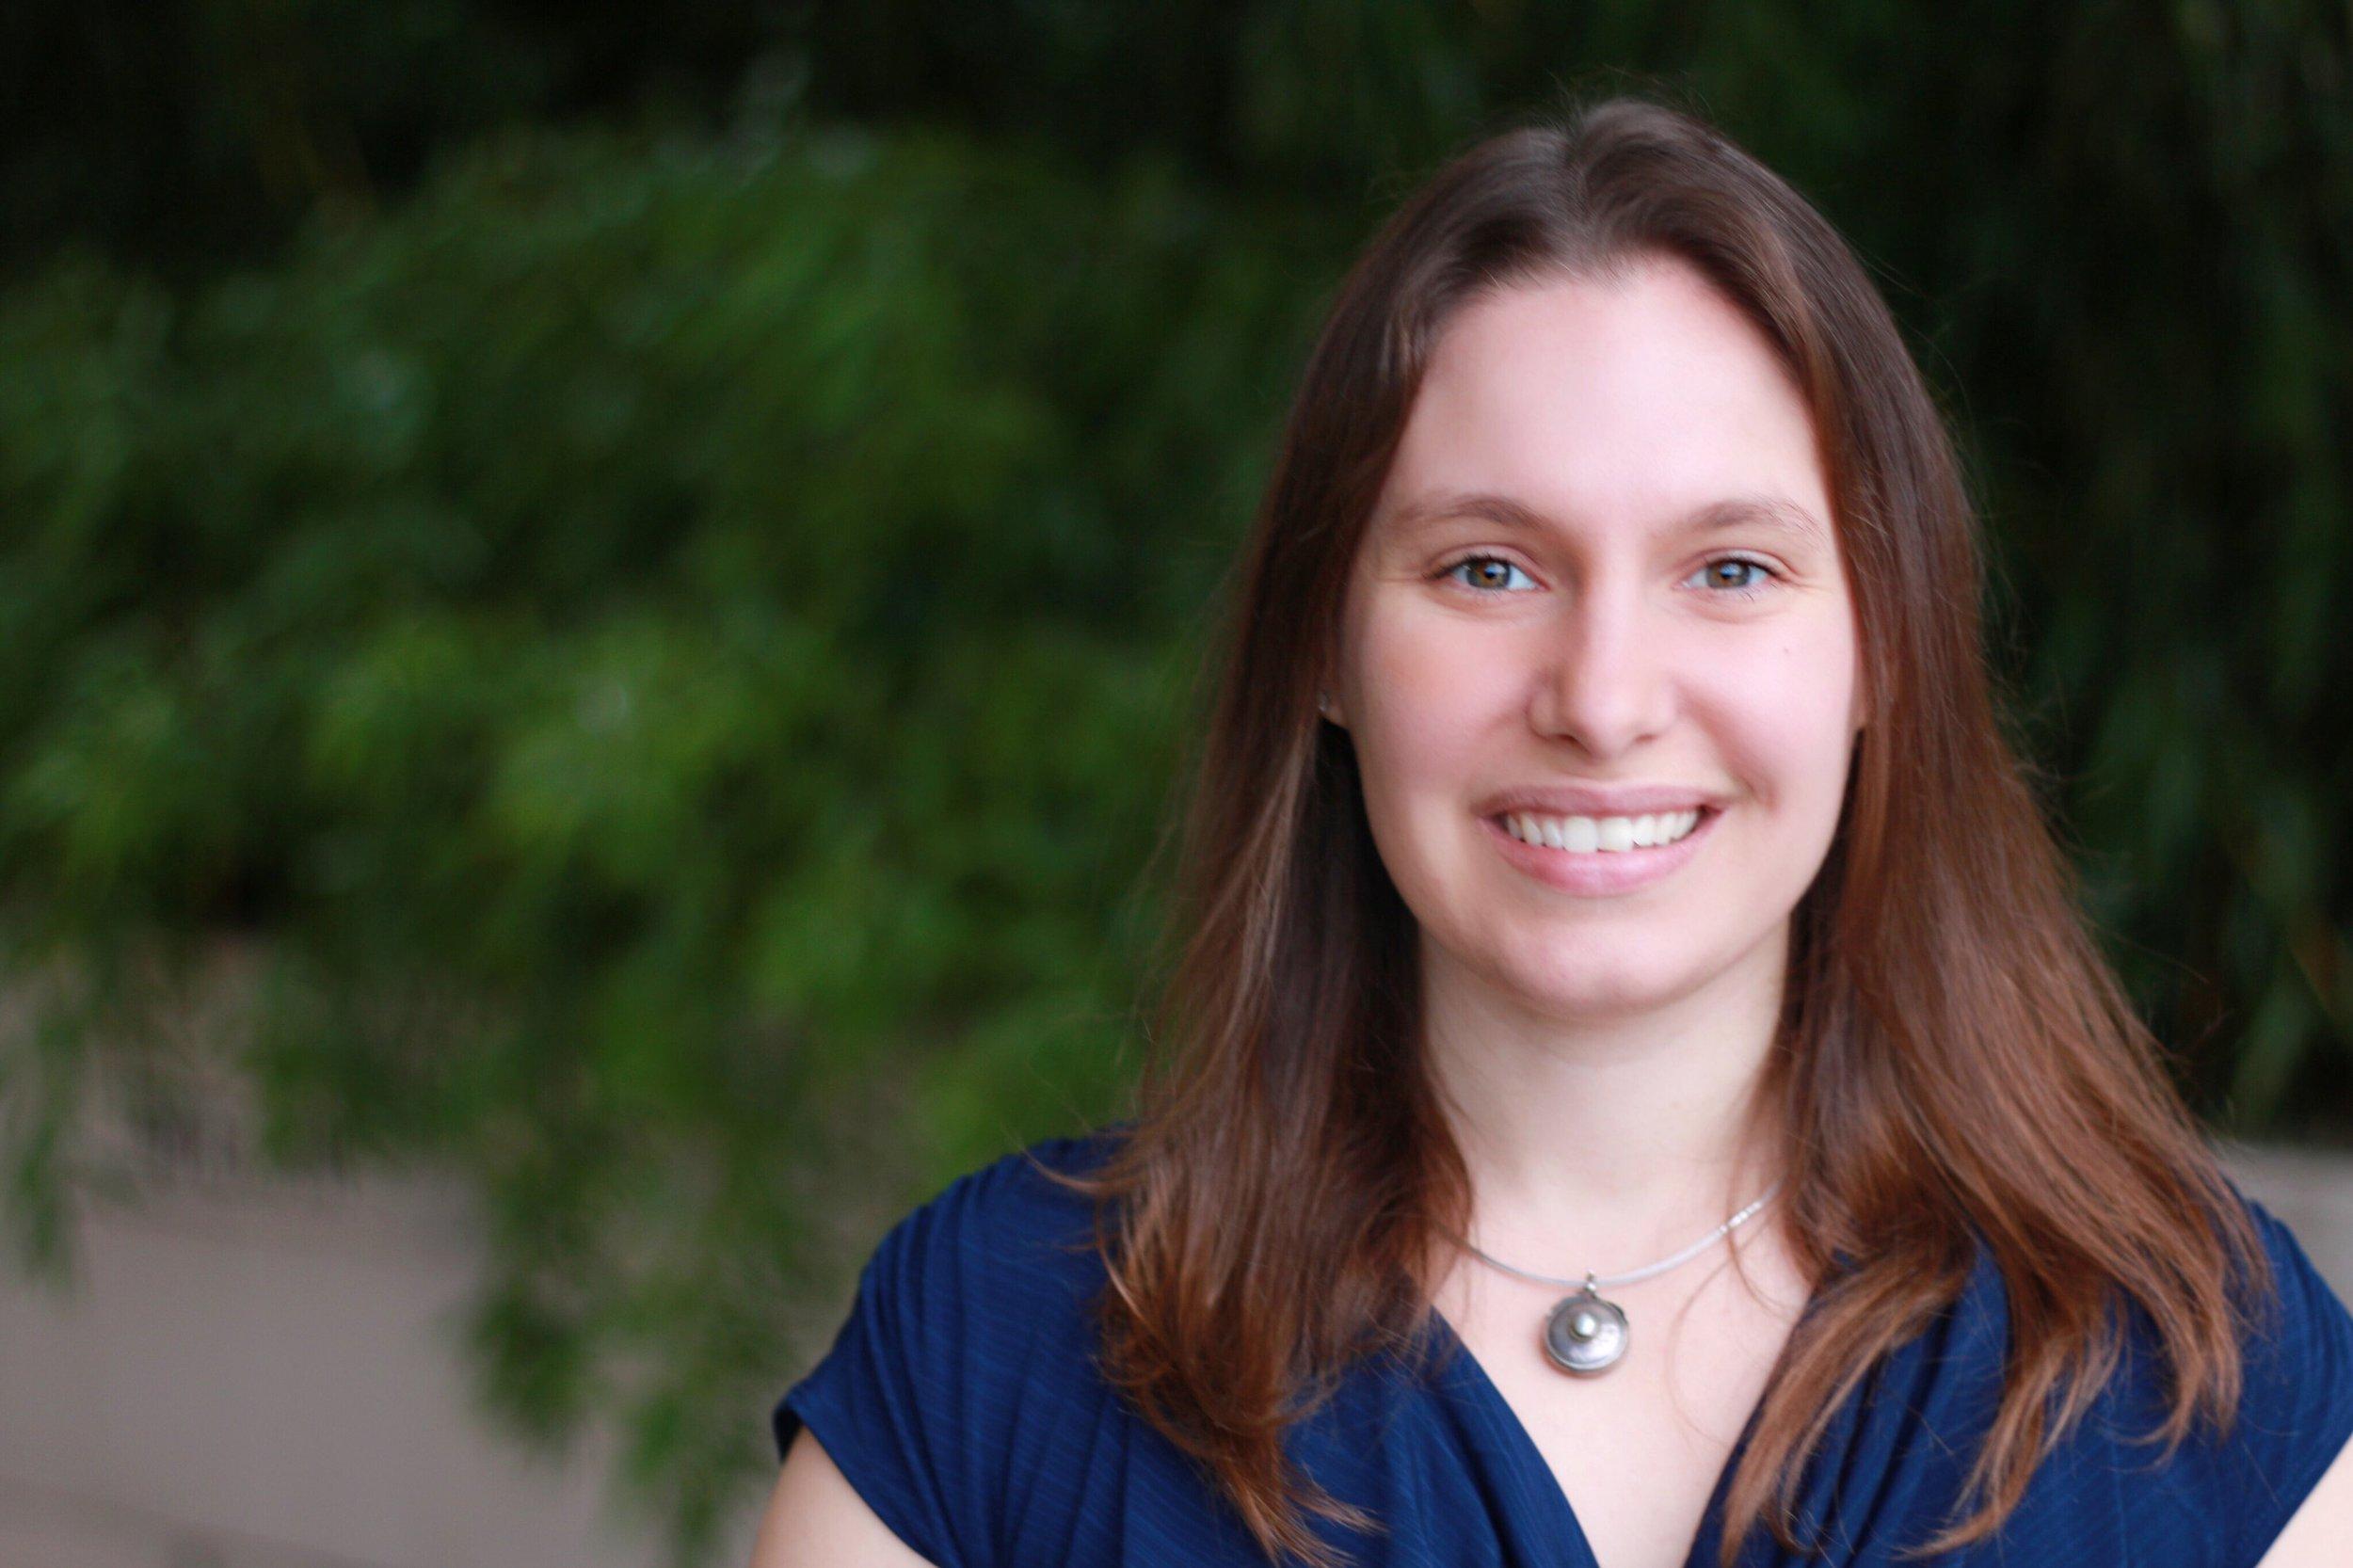 Justine Cosman Portland Physical Therapist